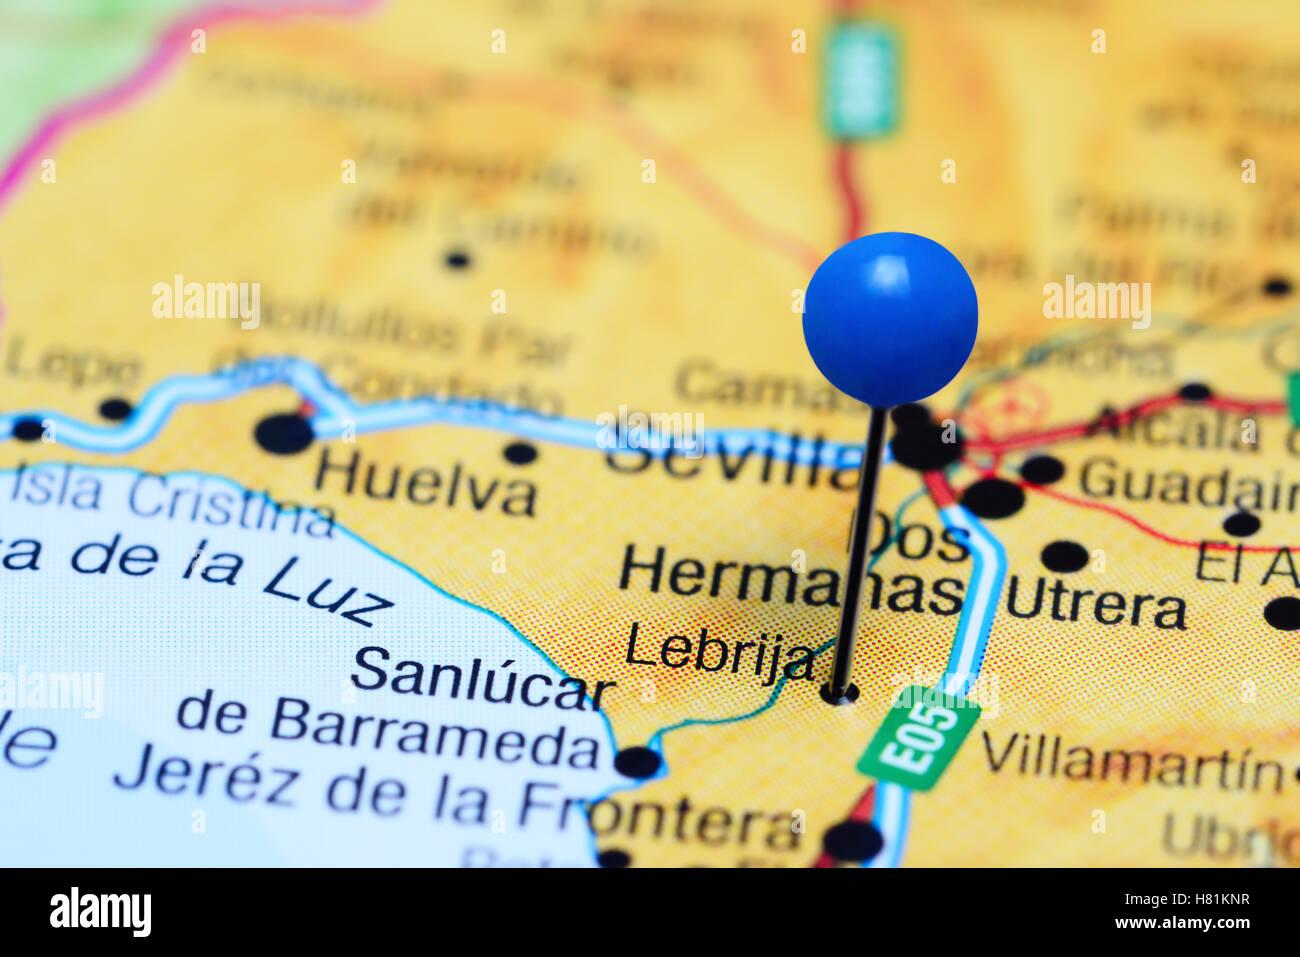 Lebrija Pinned On A Map Of Spain Stock Photo 125427283 Alamy